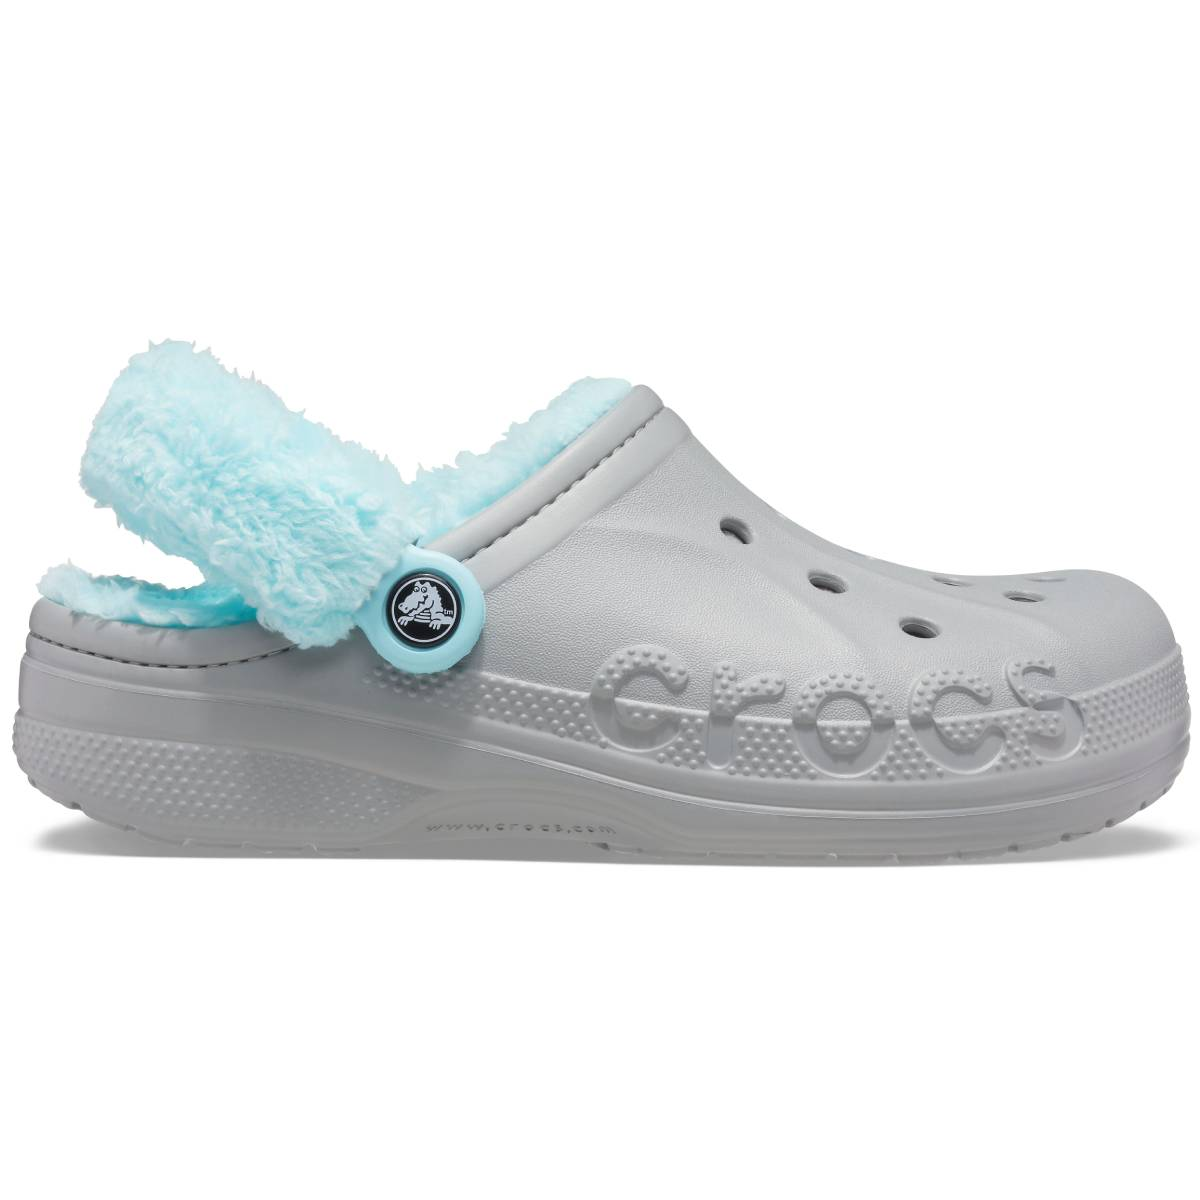 Baya Lined Fuzz Strap Clog - Light Grey/Ice Blue